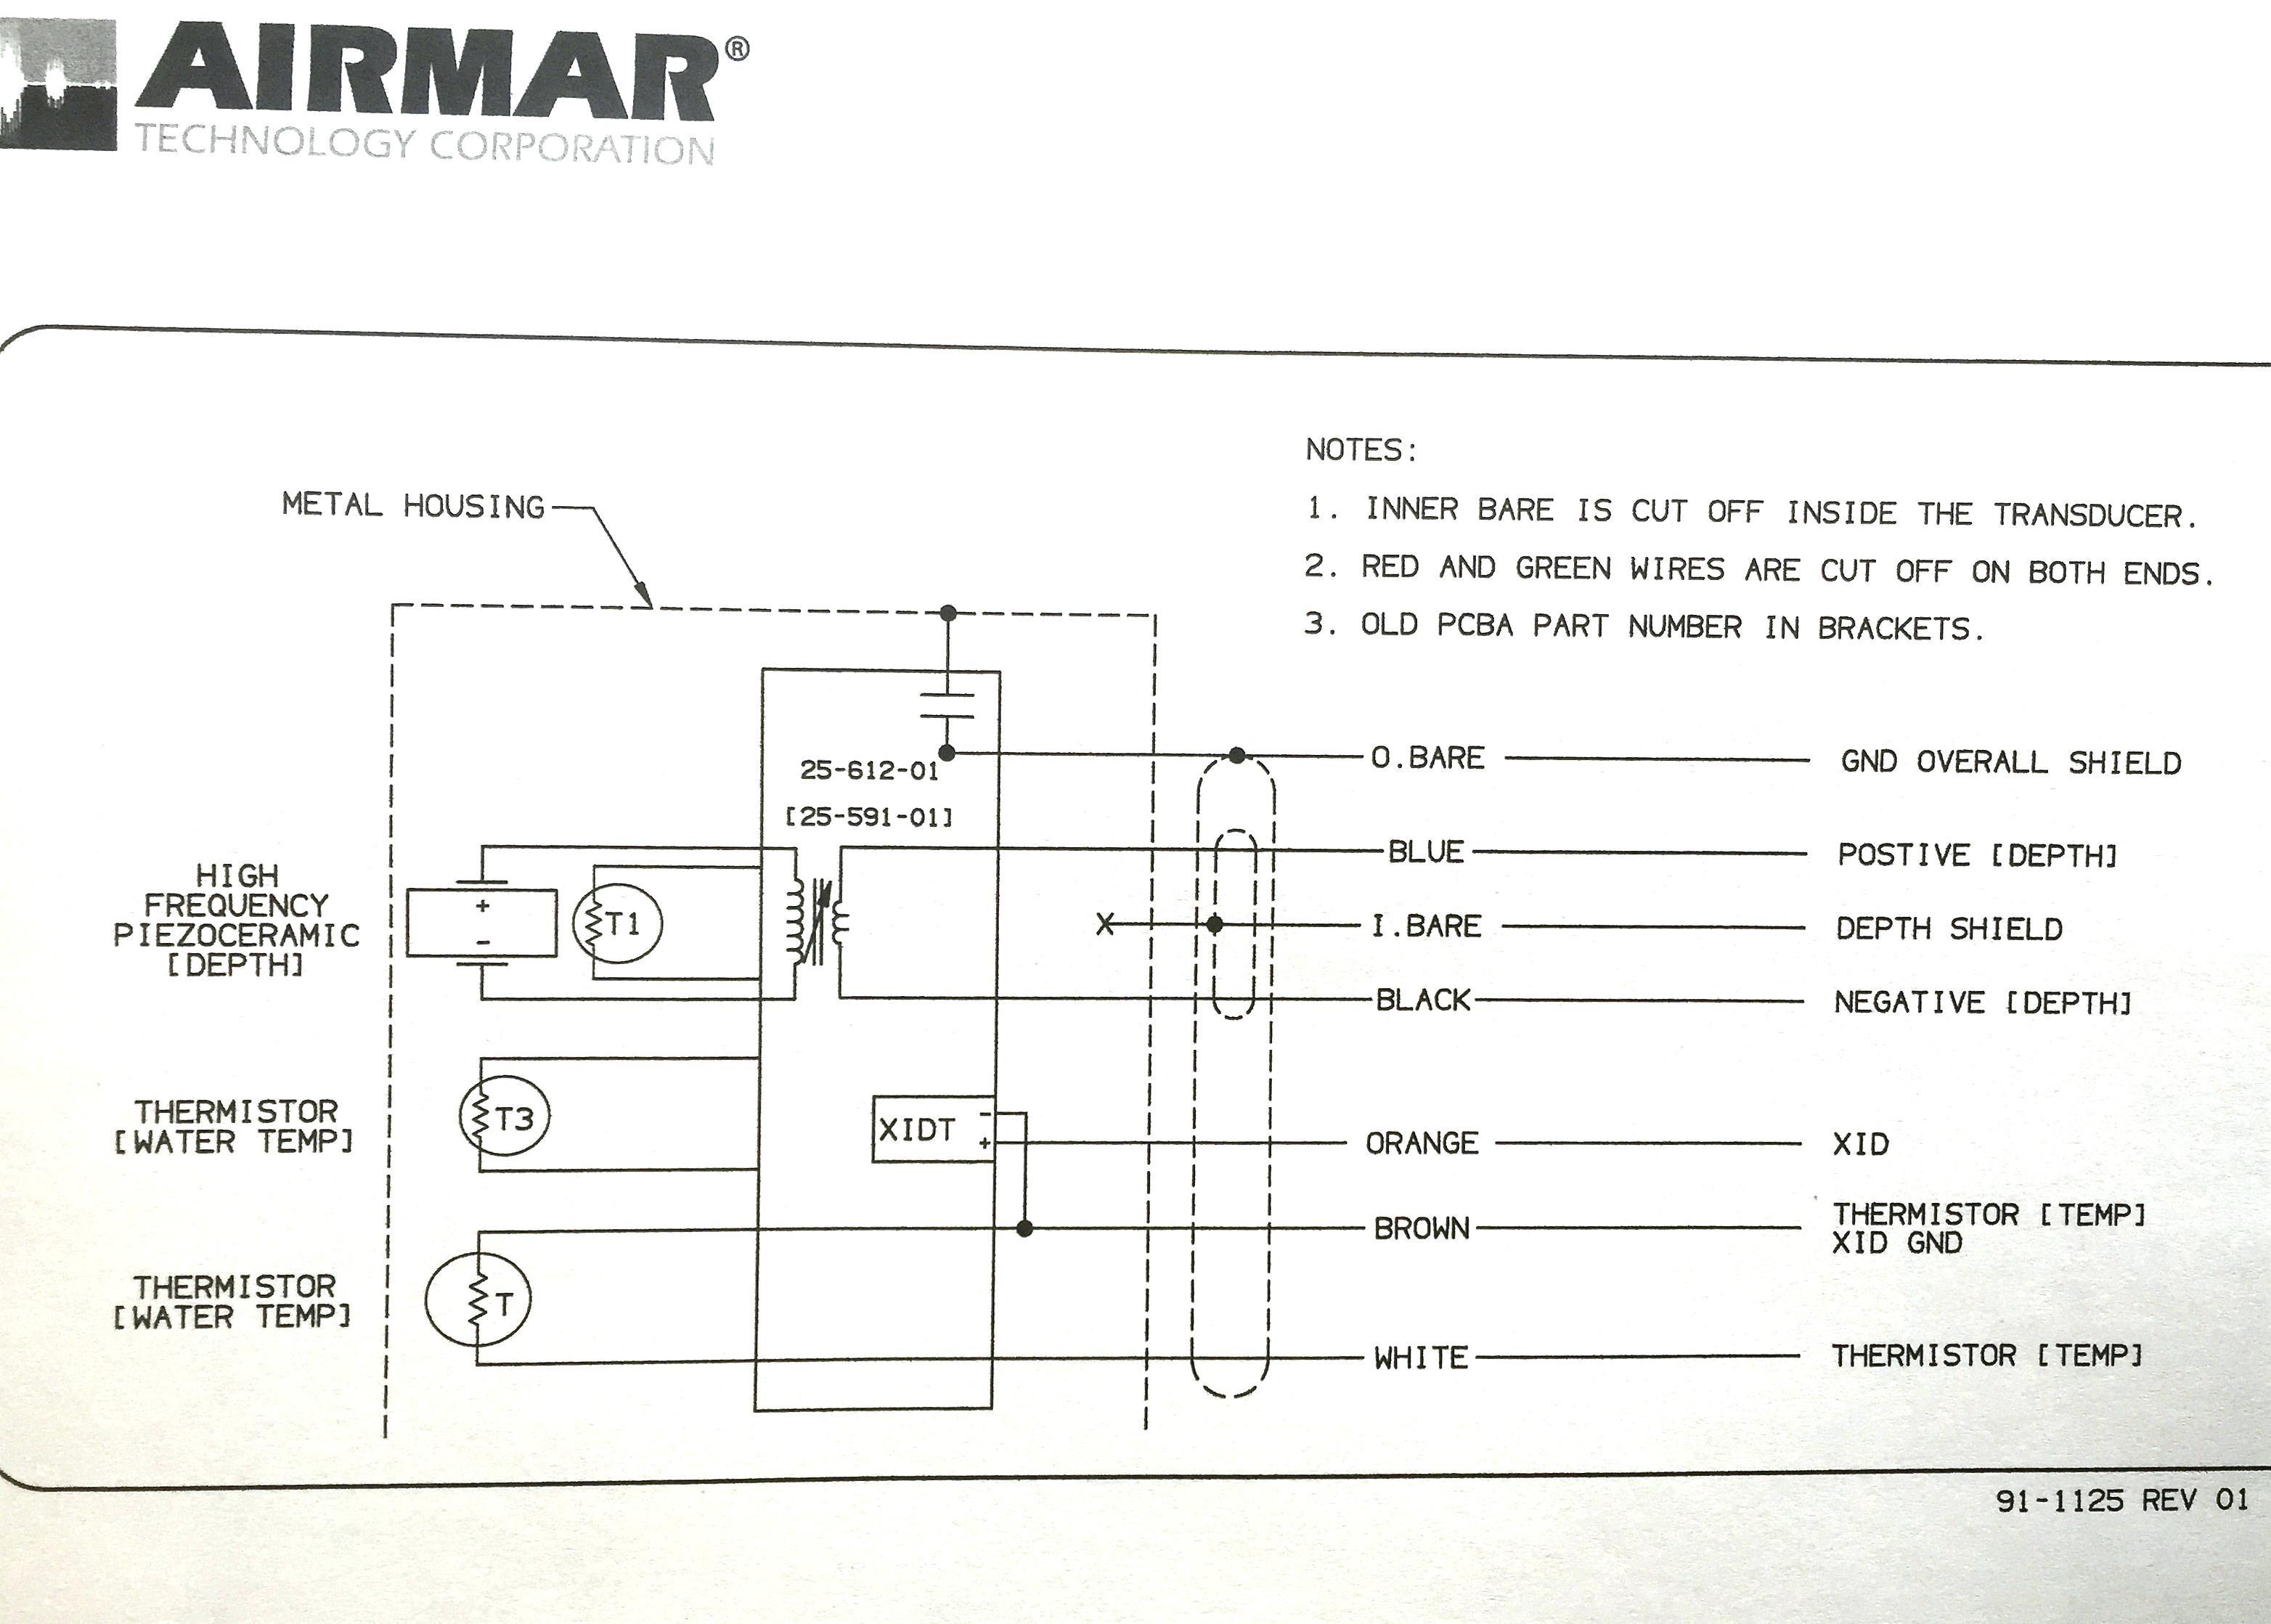 garmin nuvi wiring diagram garmin transducer wiring diagram 4 pin wiring diagram data  garmin transducer wiring diagram 4 pin